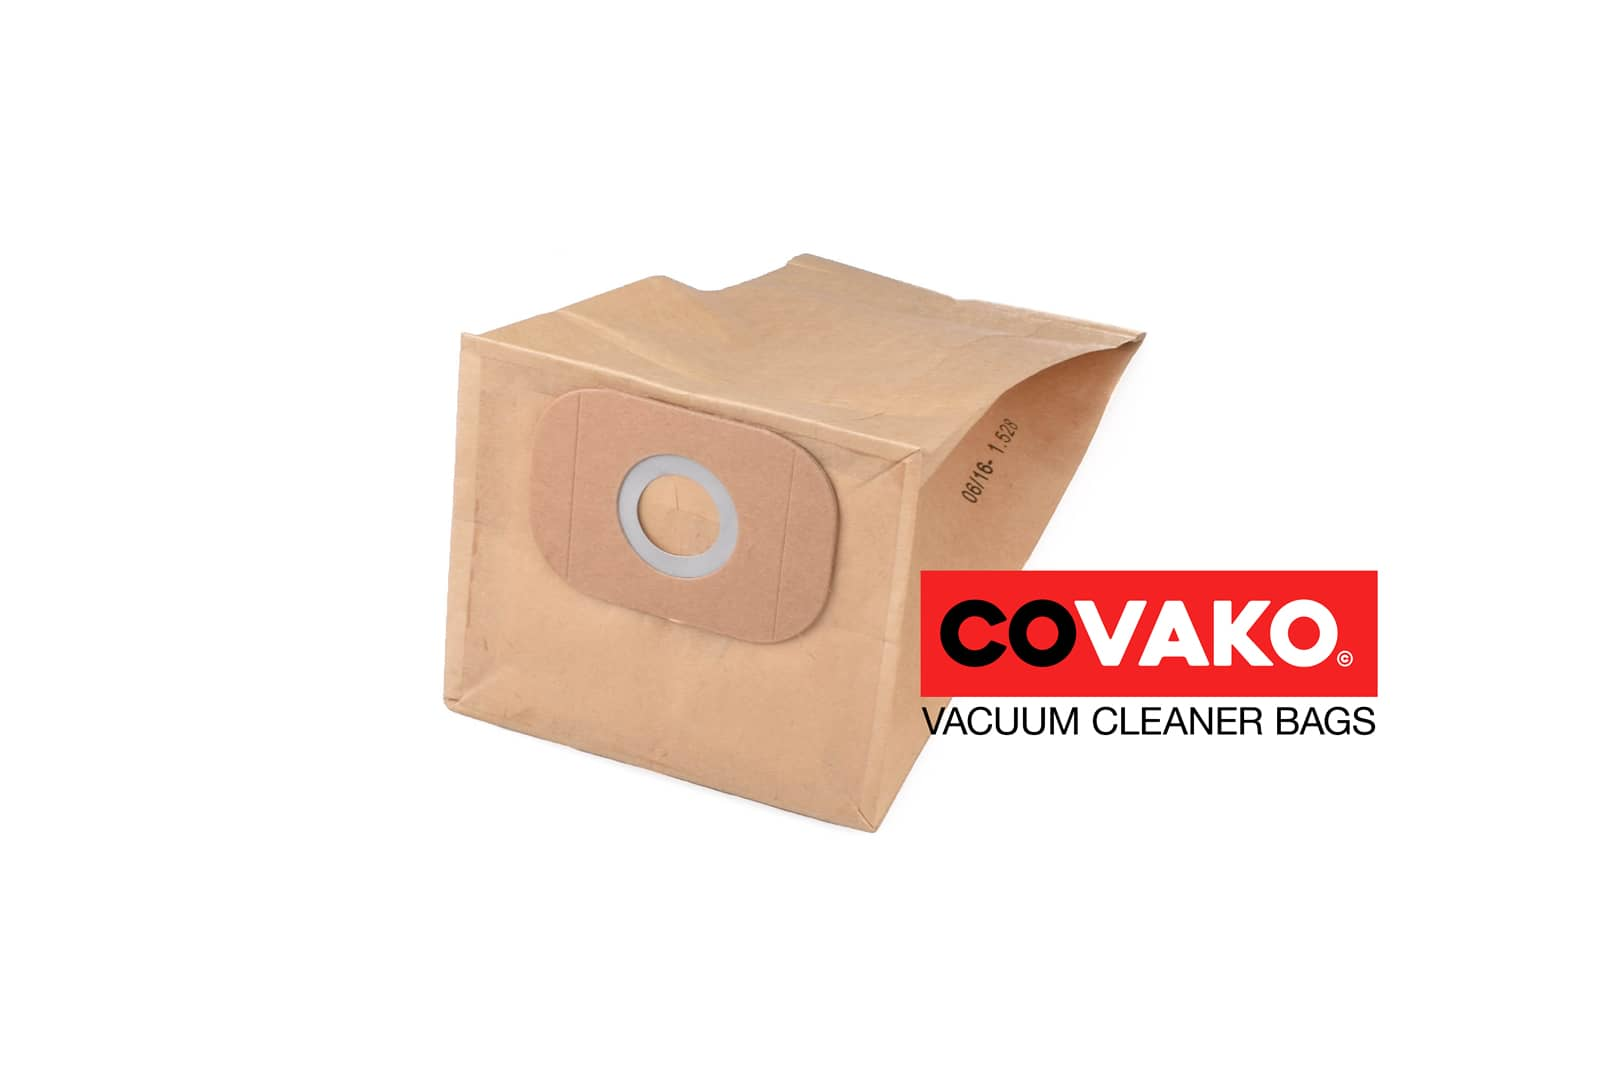 Kärcher T 191 / Paper - Kärcher vacuum cleaner bags